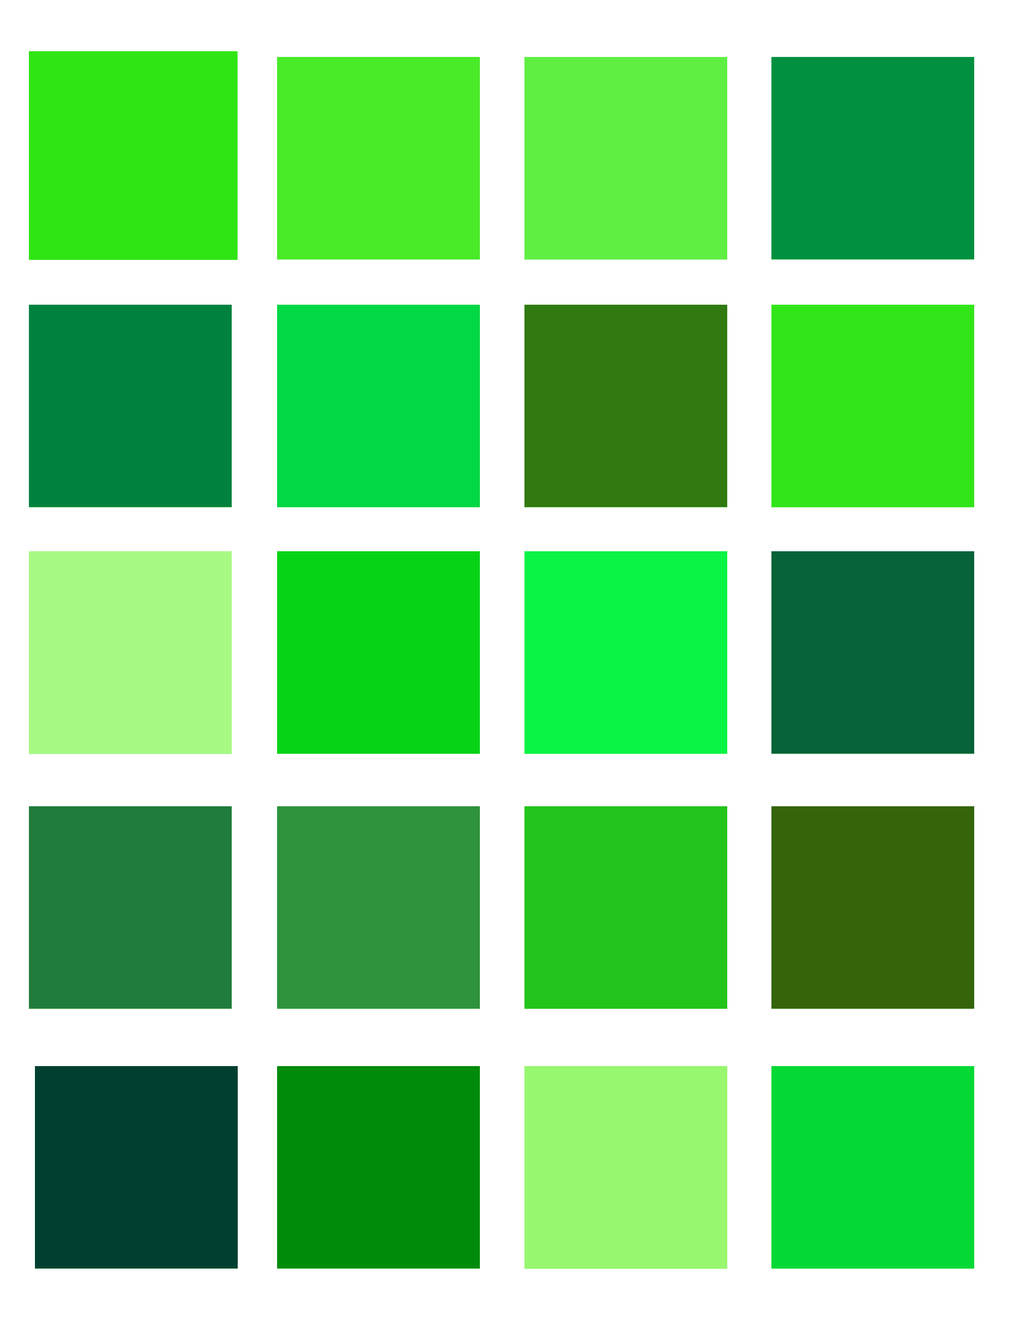 Uncategorized Colour Combinations With Green green and blue colour scheme home design architecture cilif com neon color palette by oceanisuna on deviantart scheme